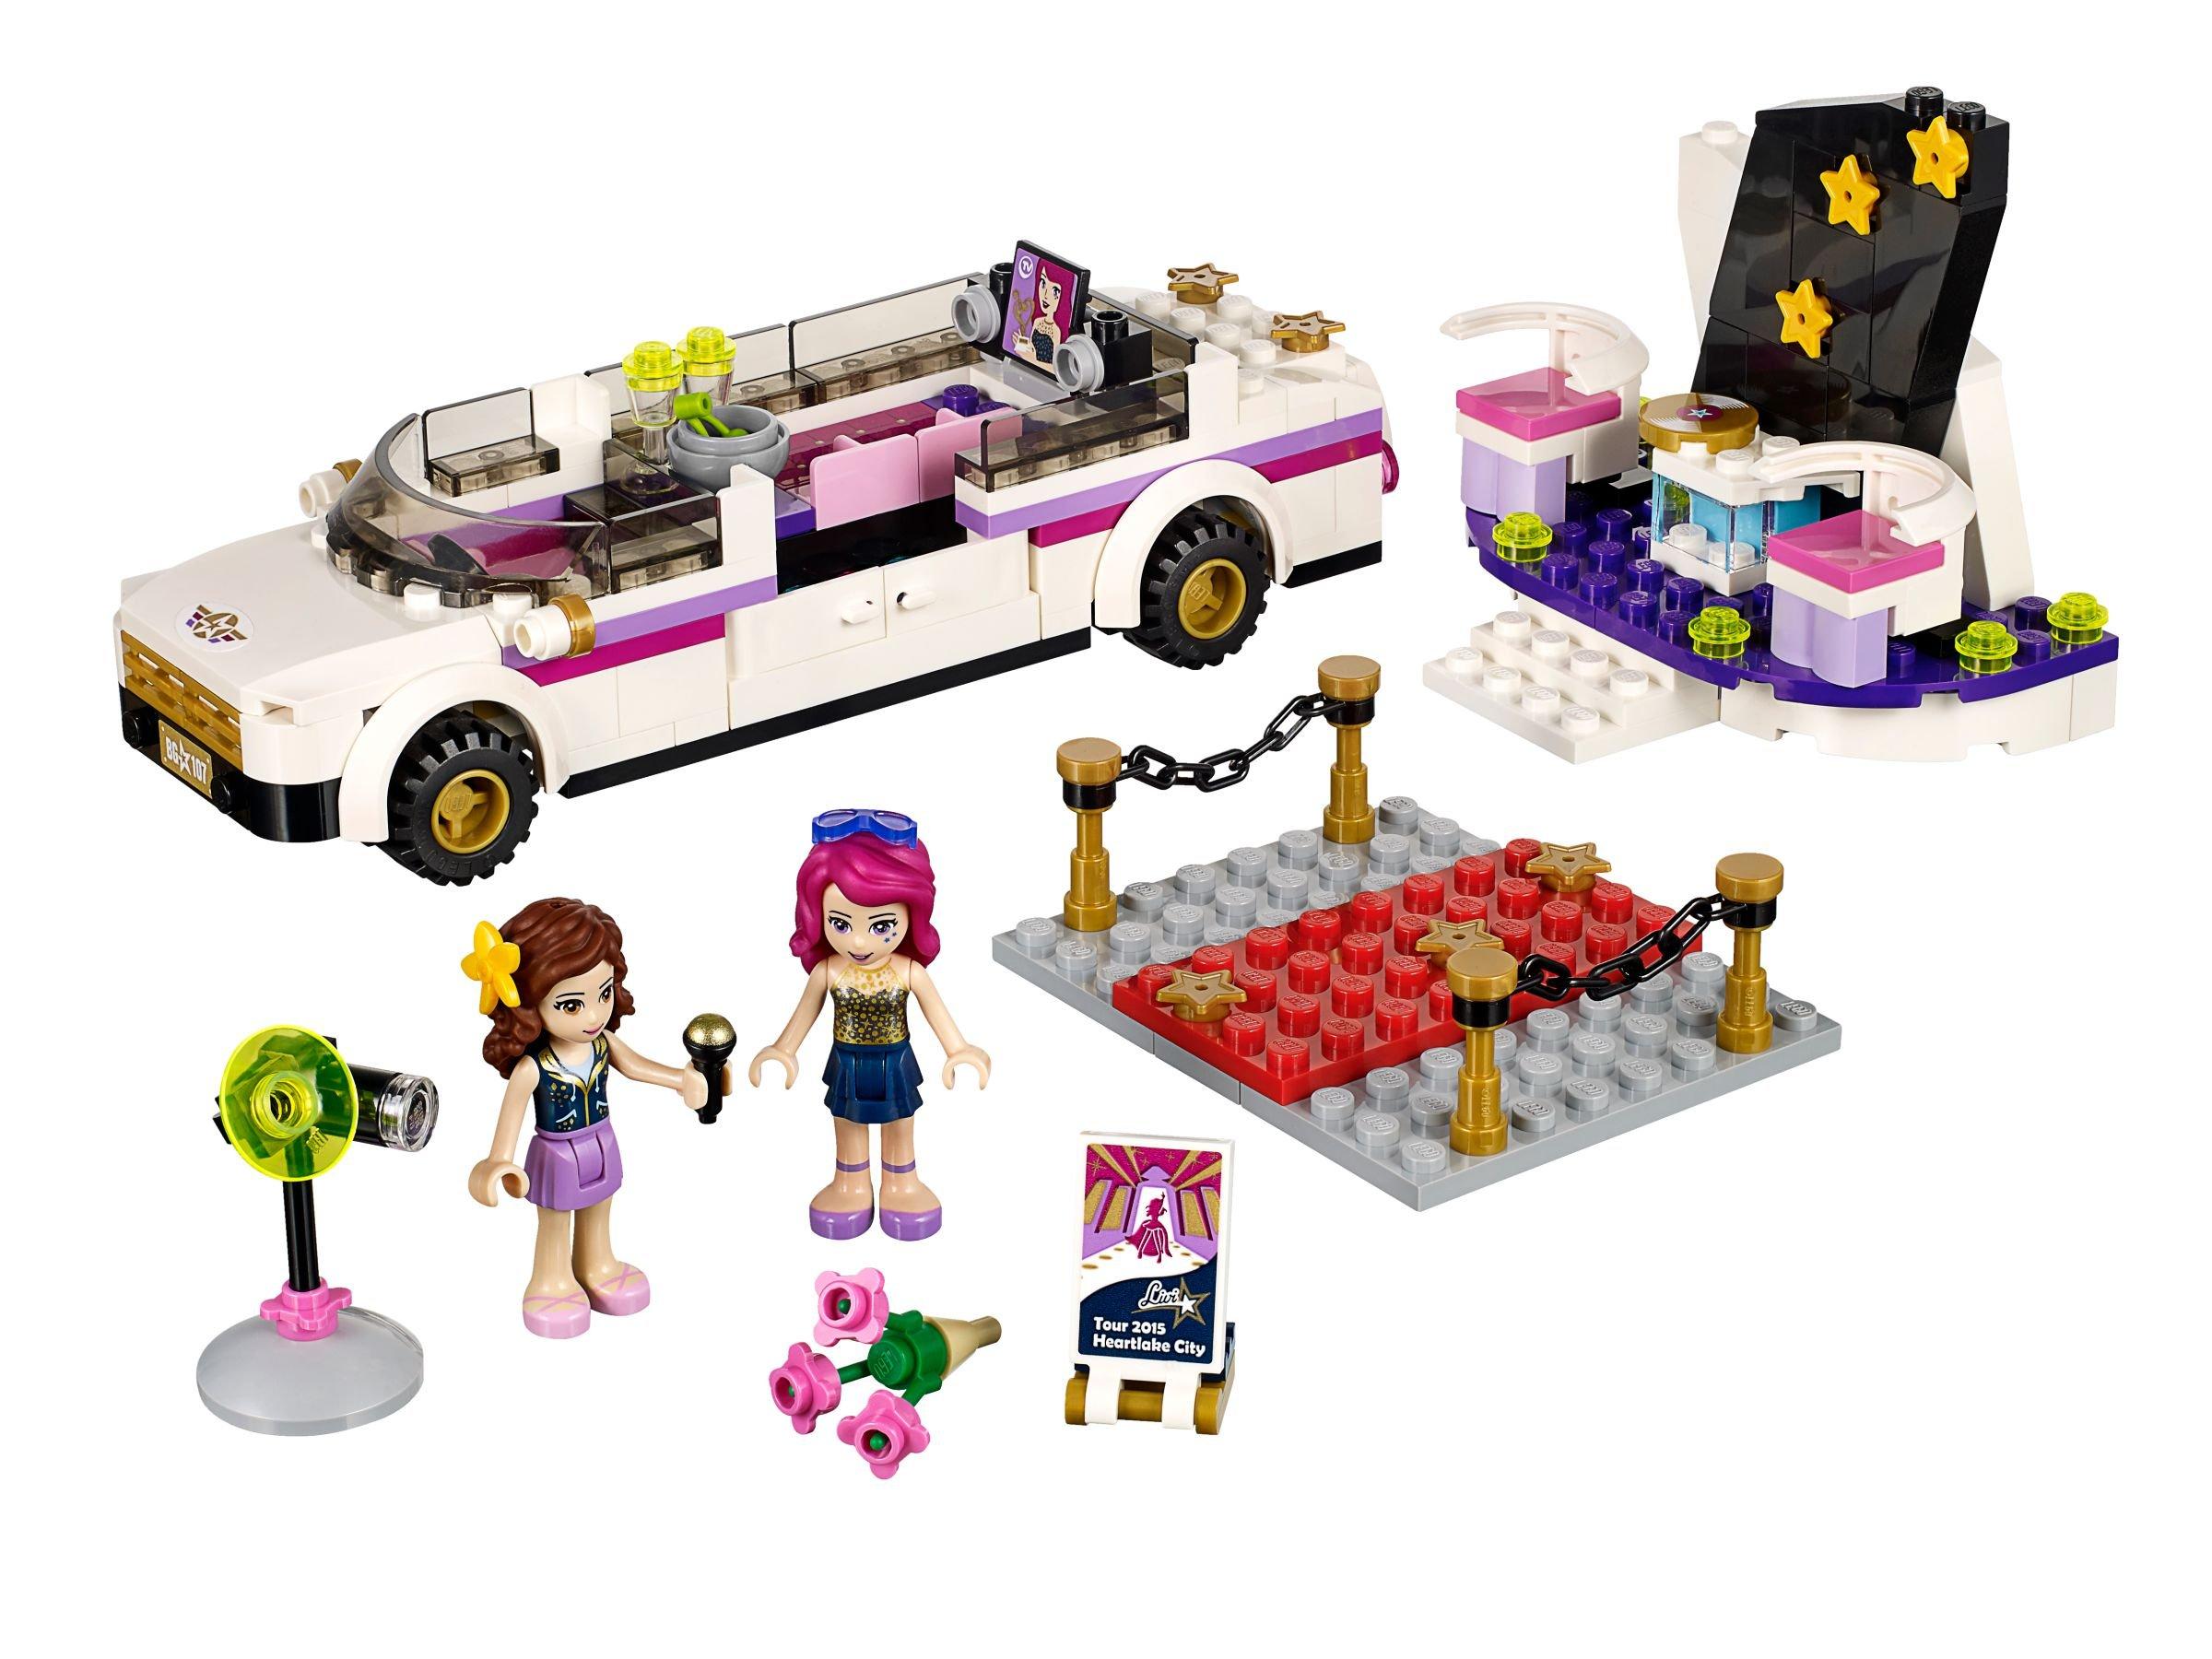 lego friends 41107 popstar limousine brickmerge preisvergleich. Black Bedroom Furniture Sets. Home Design Ideas